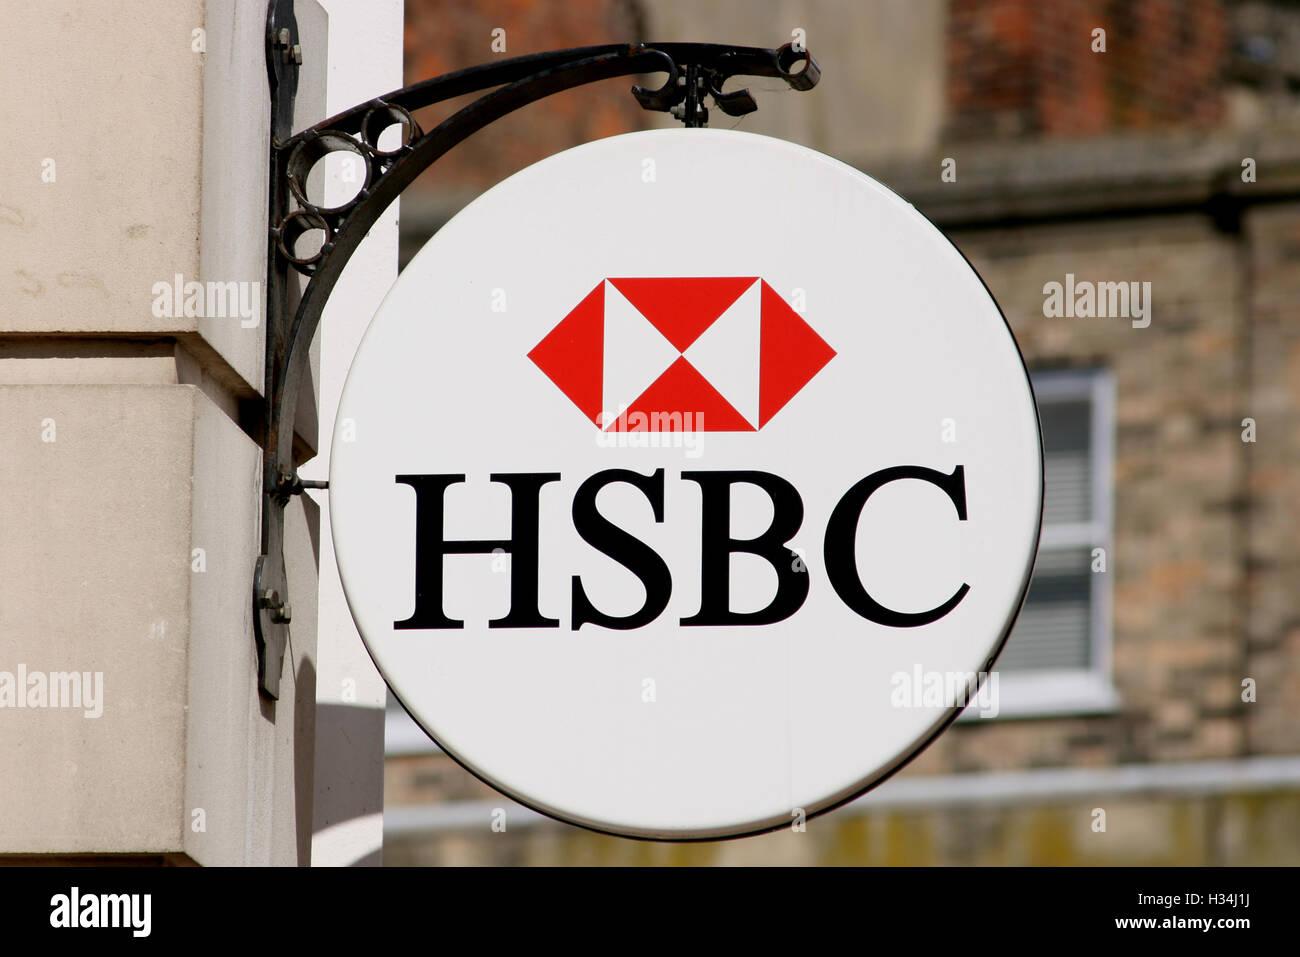 HSBC bank sign, High Street, Chelmsford, Essex, England - Stock Image